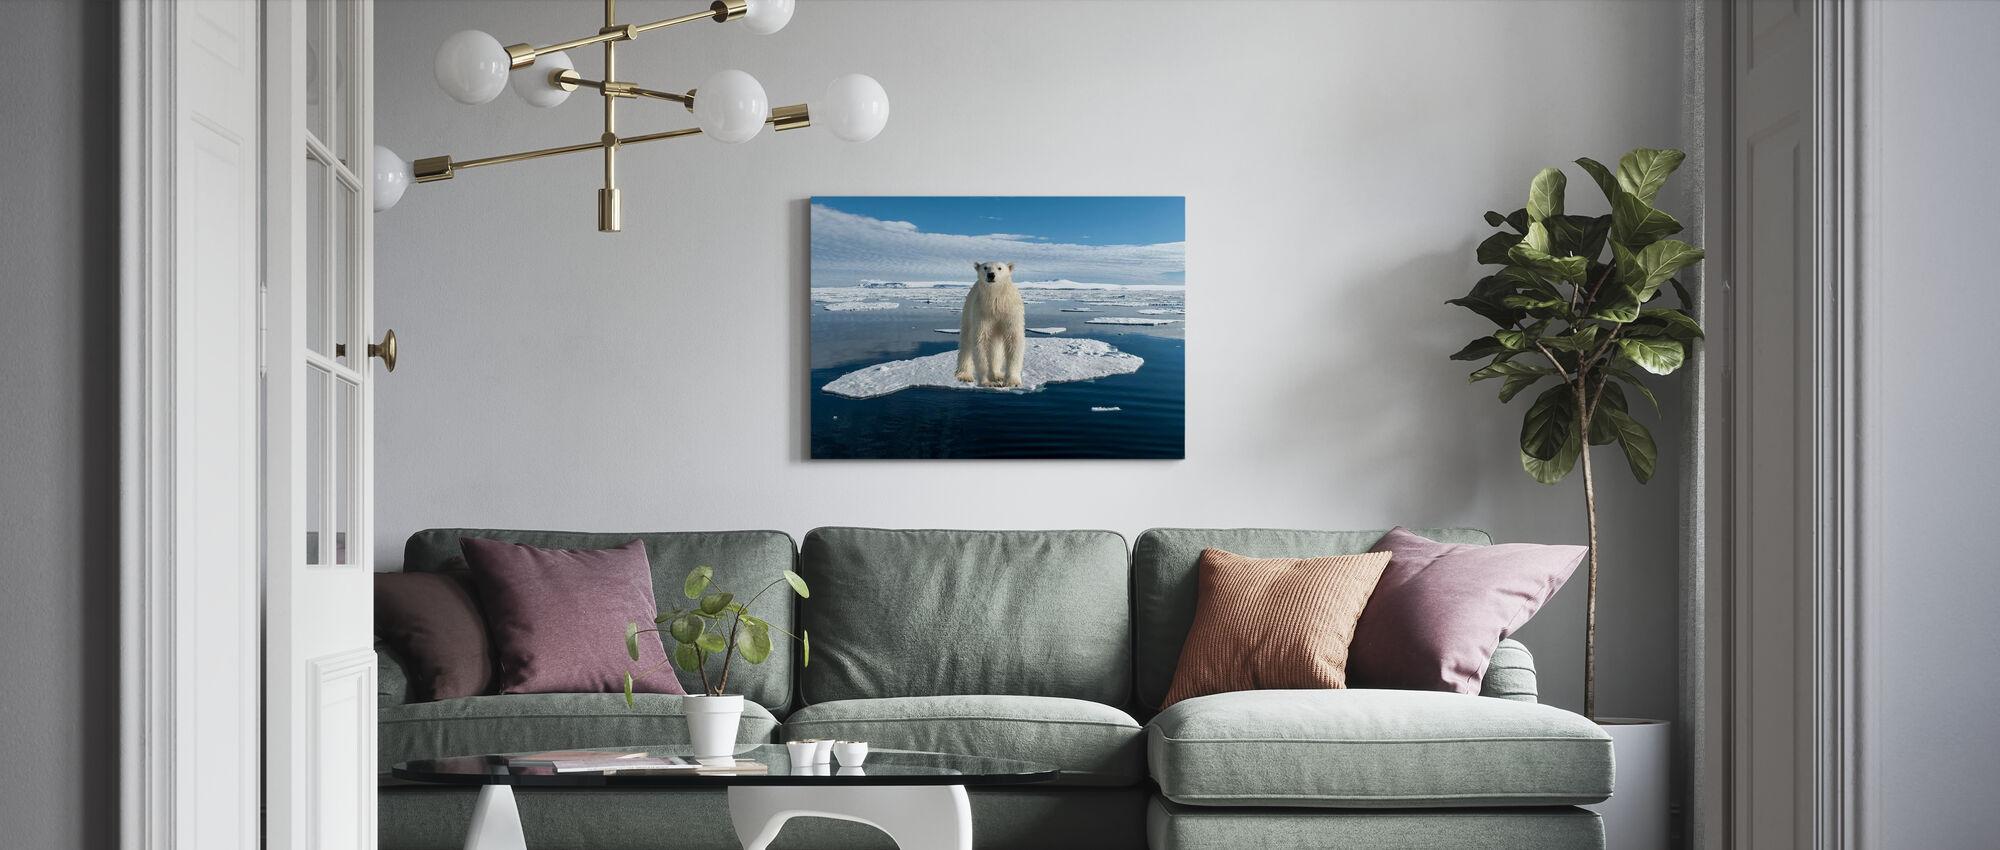 On Thin Ice - Canvas print - Living Room